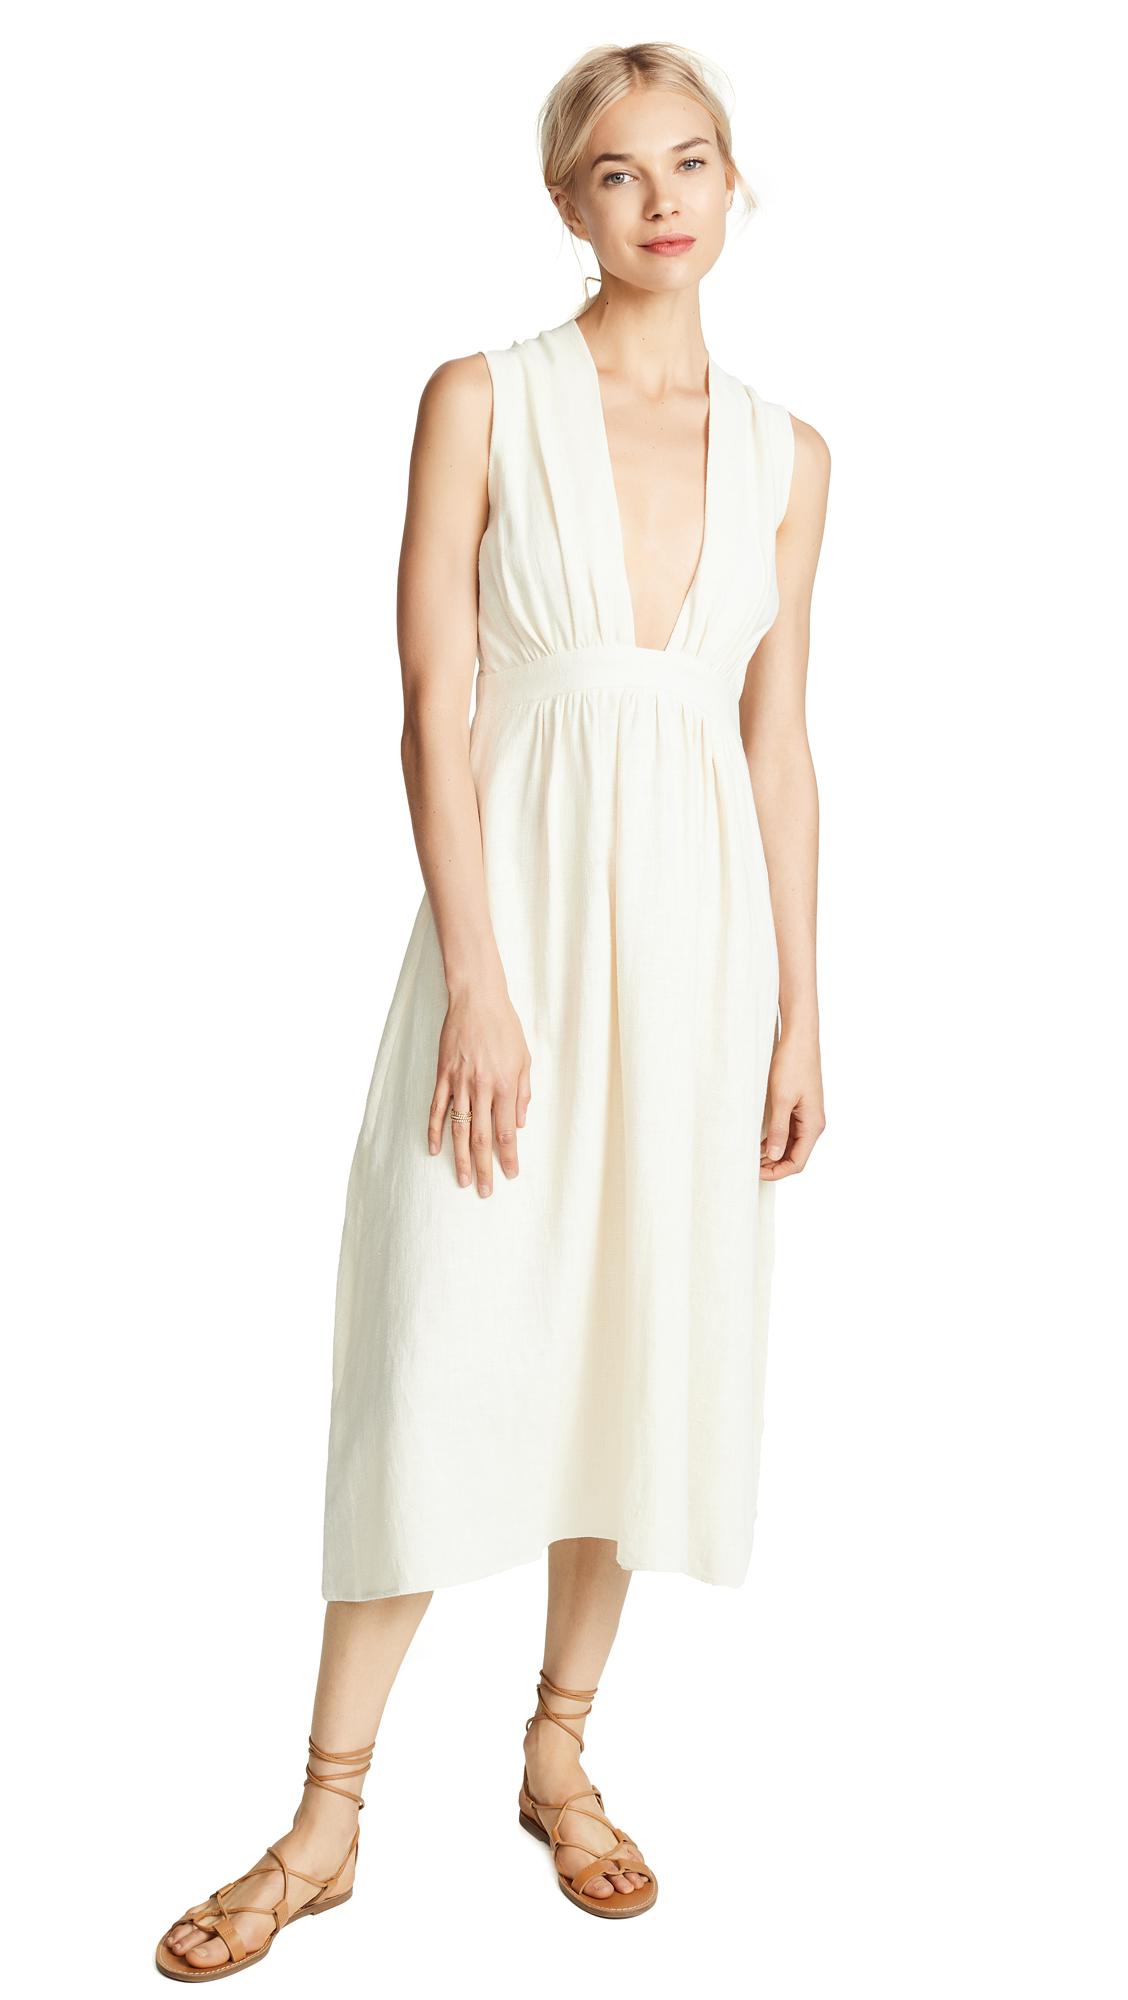 STYLEKEEPERS Kamari Dress in Creamy Beige